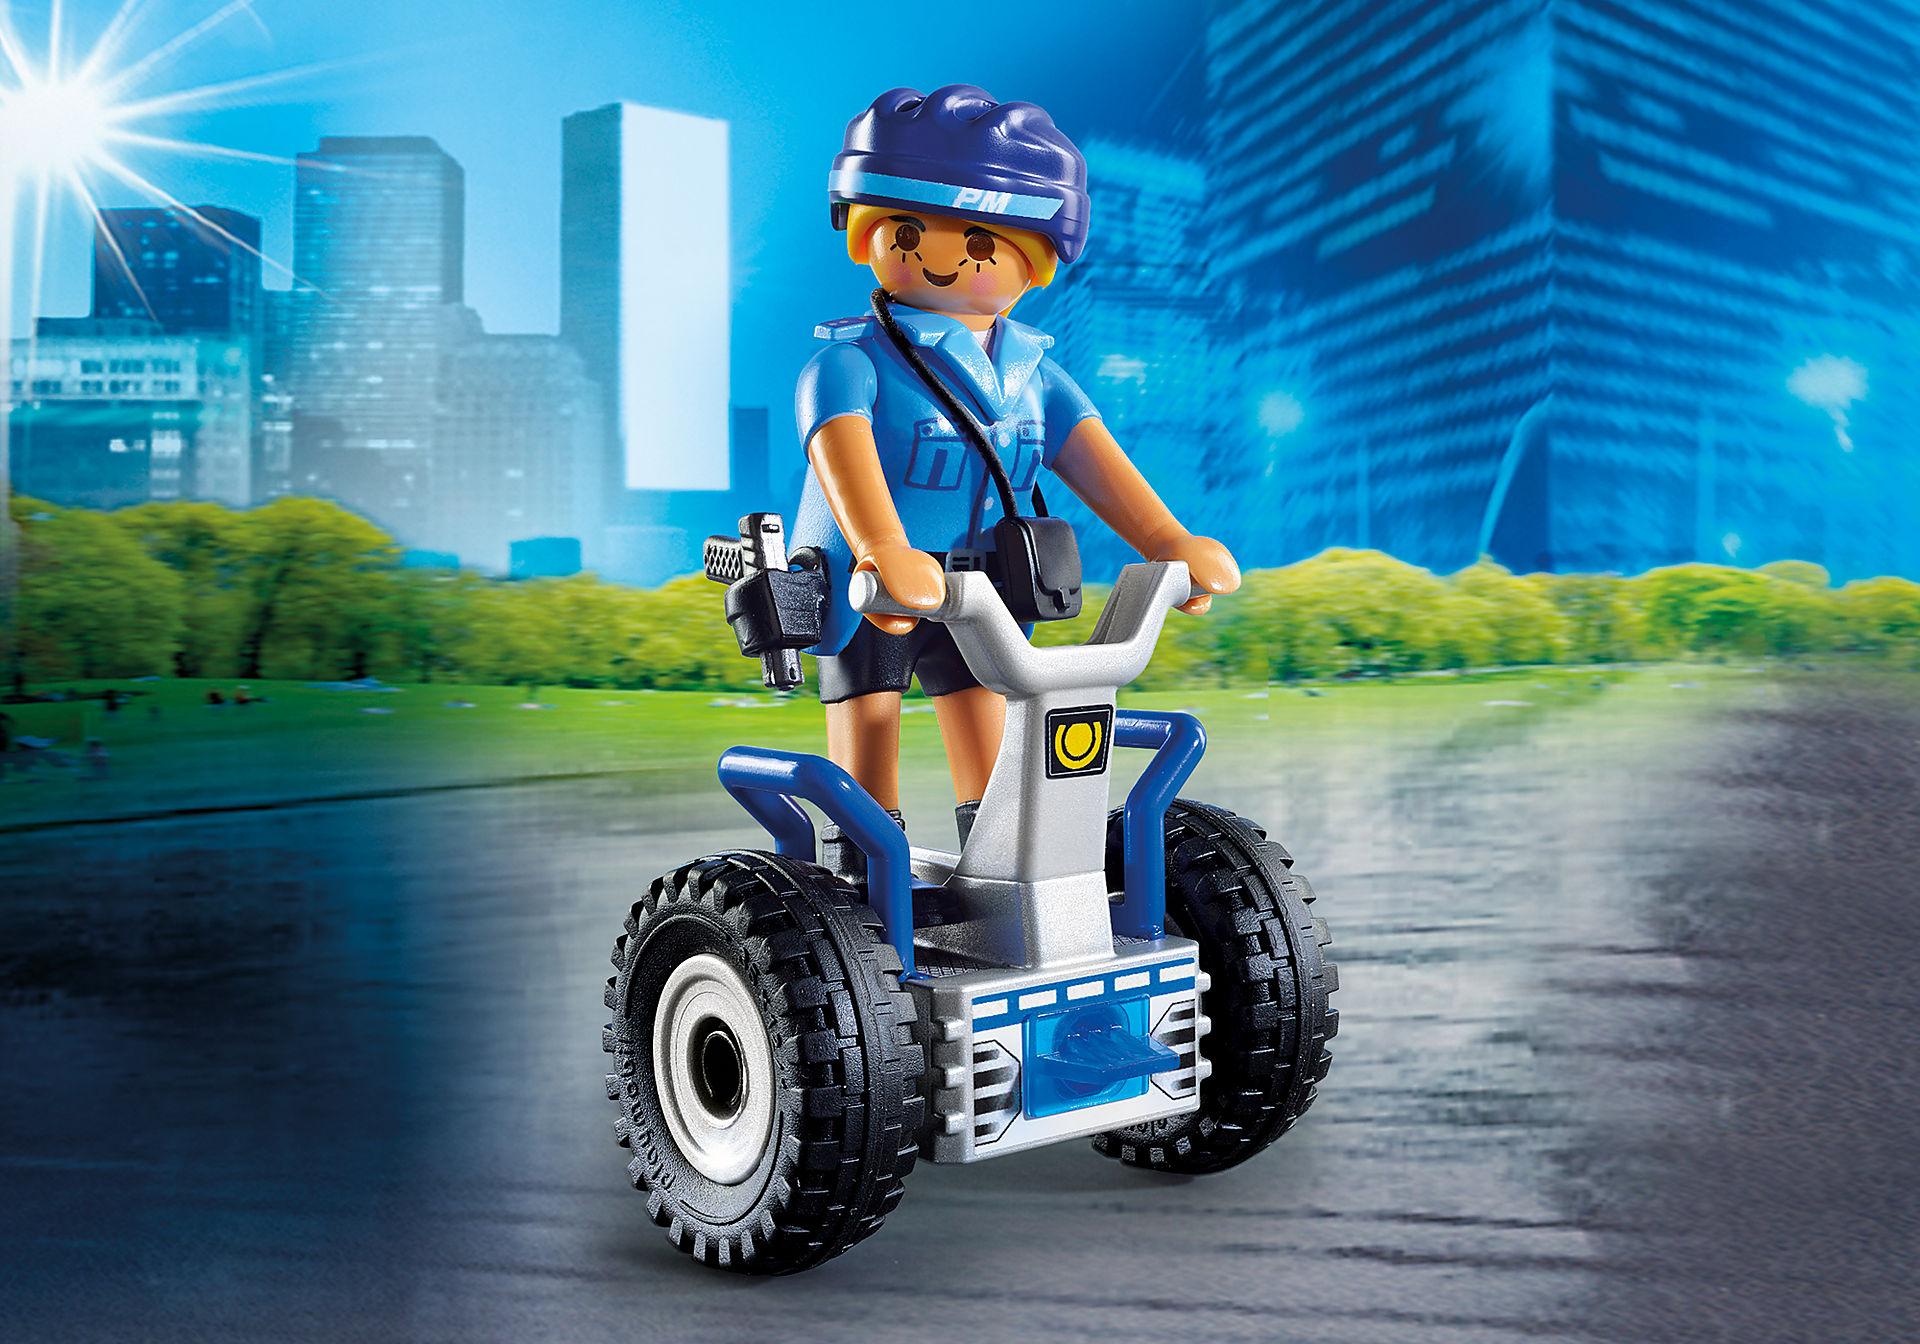 6877 Polizistin mit Balance-Racer zoom image1